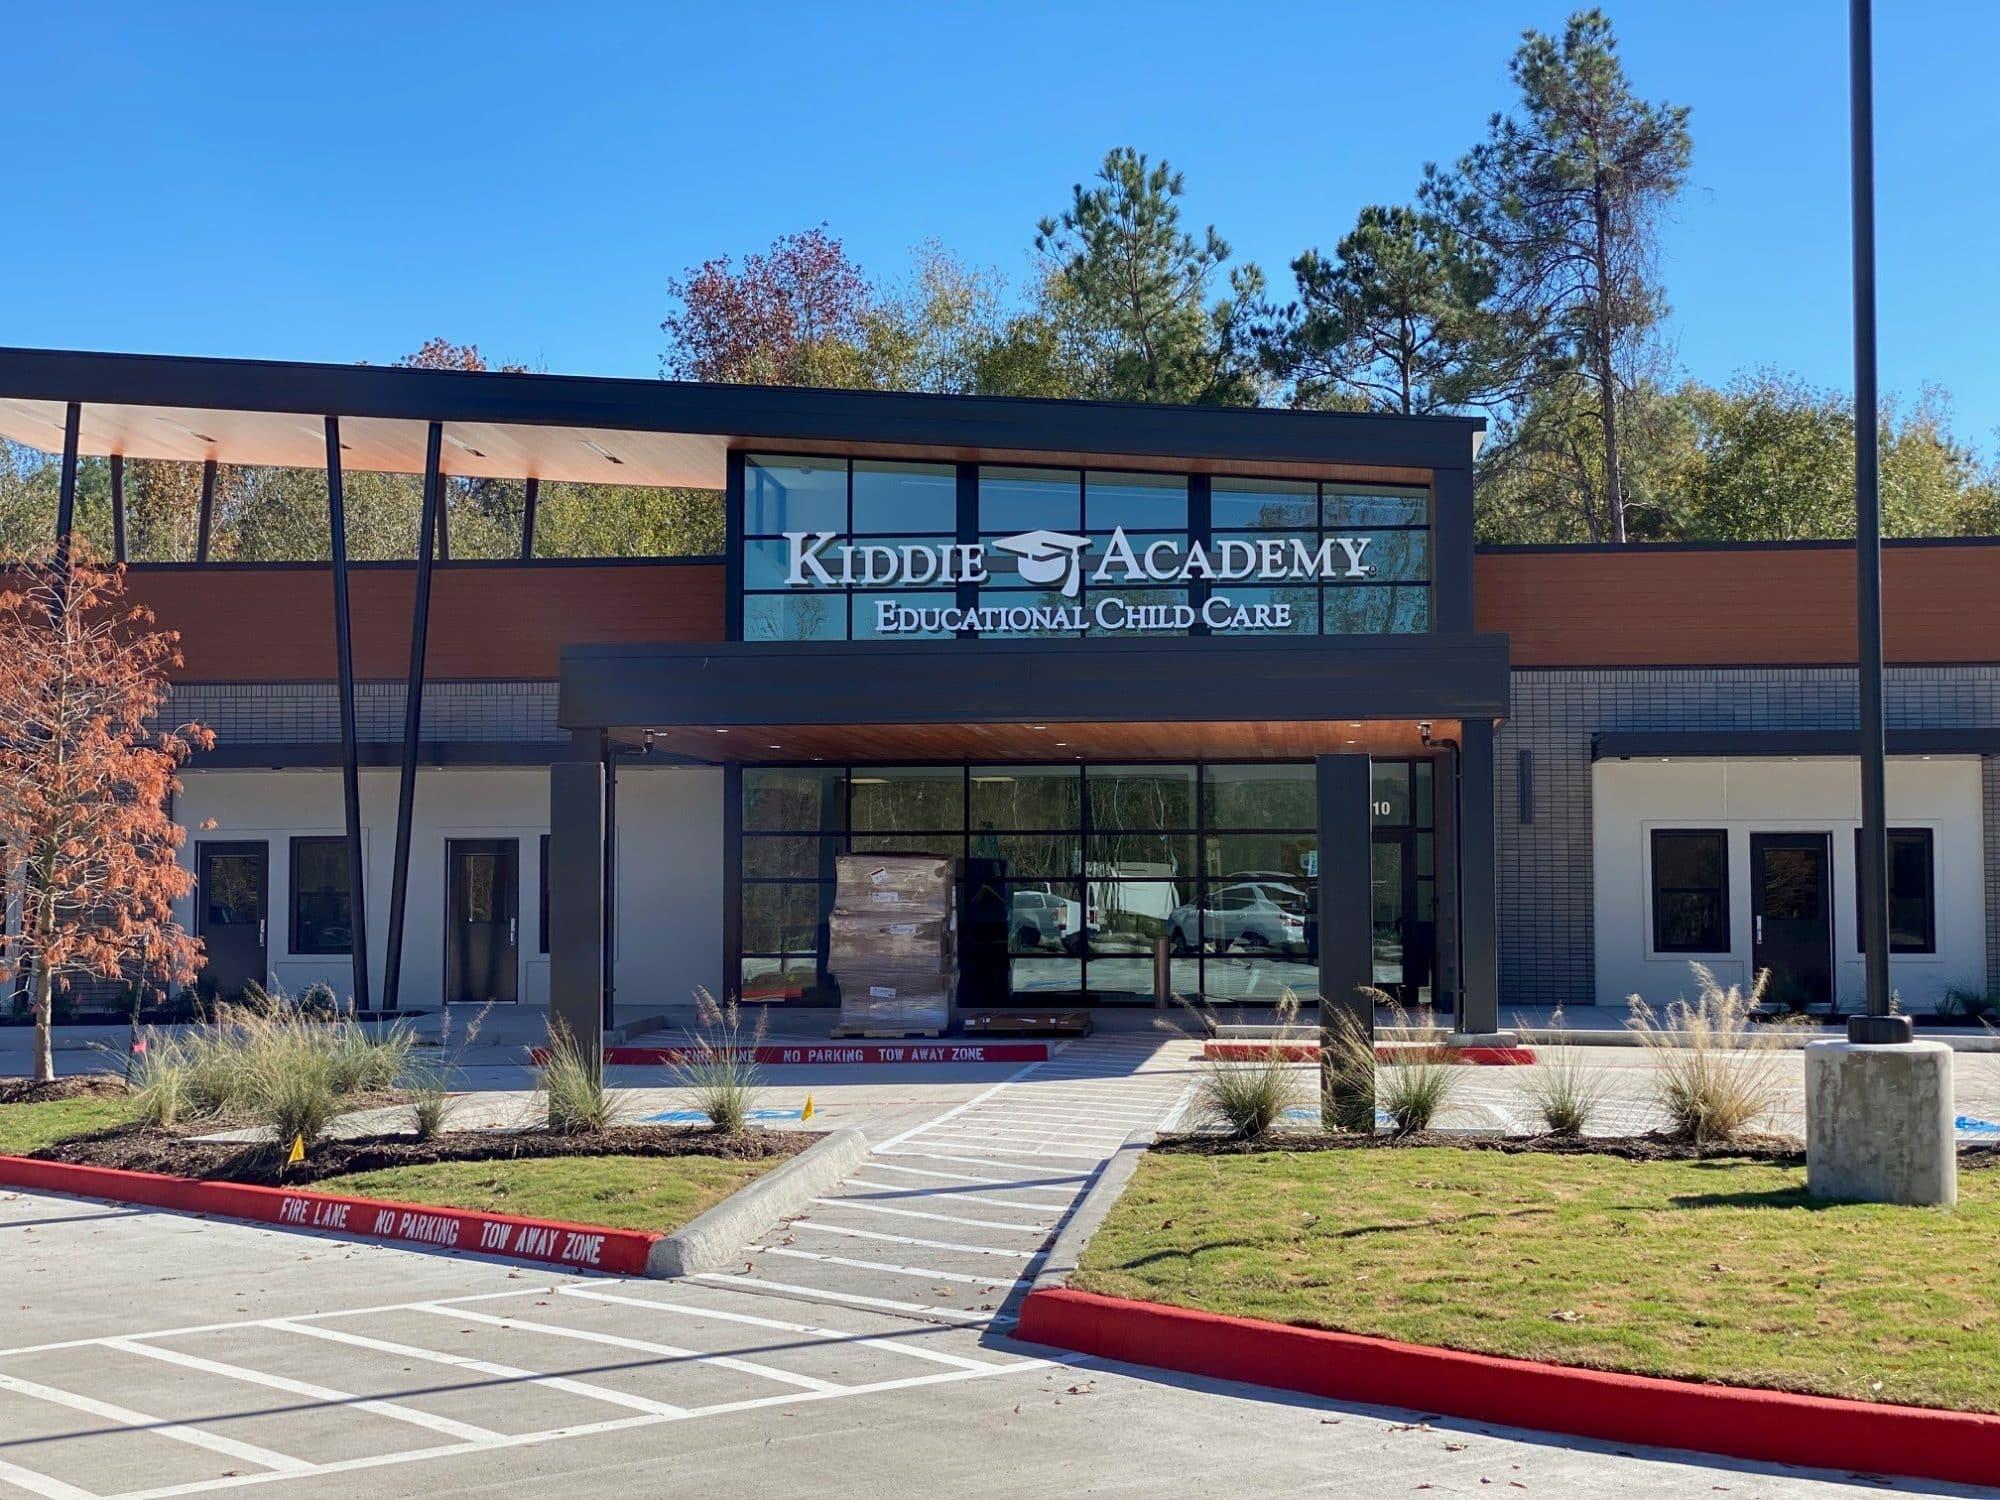 Kiddie Academy of Atascocita